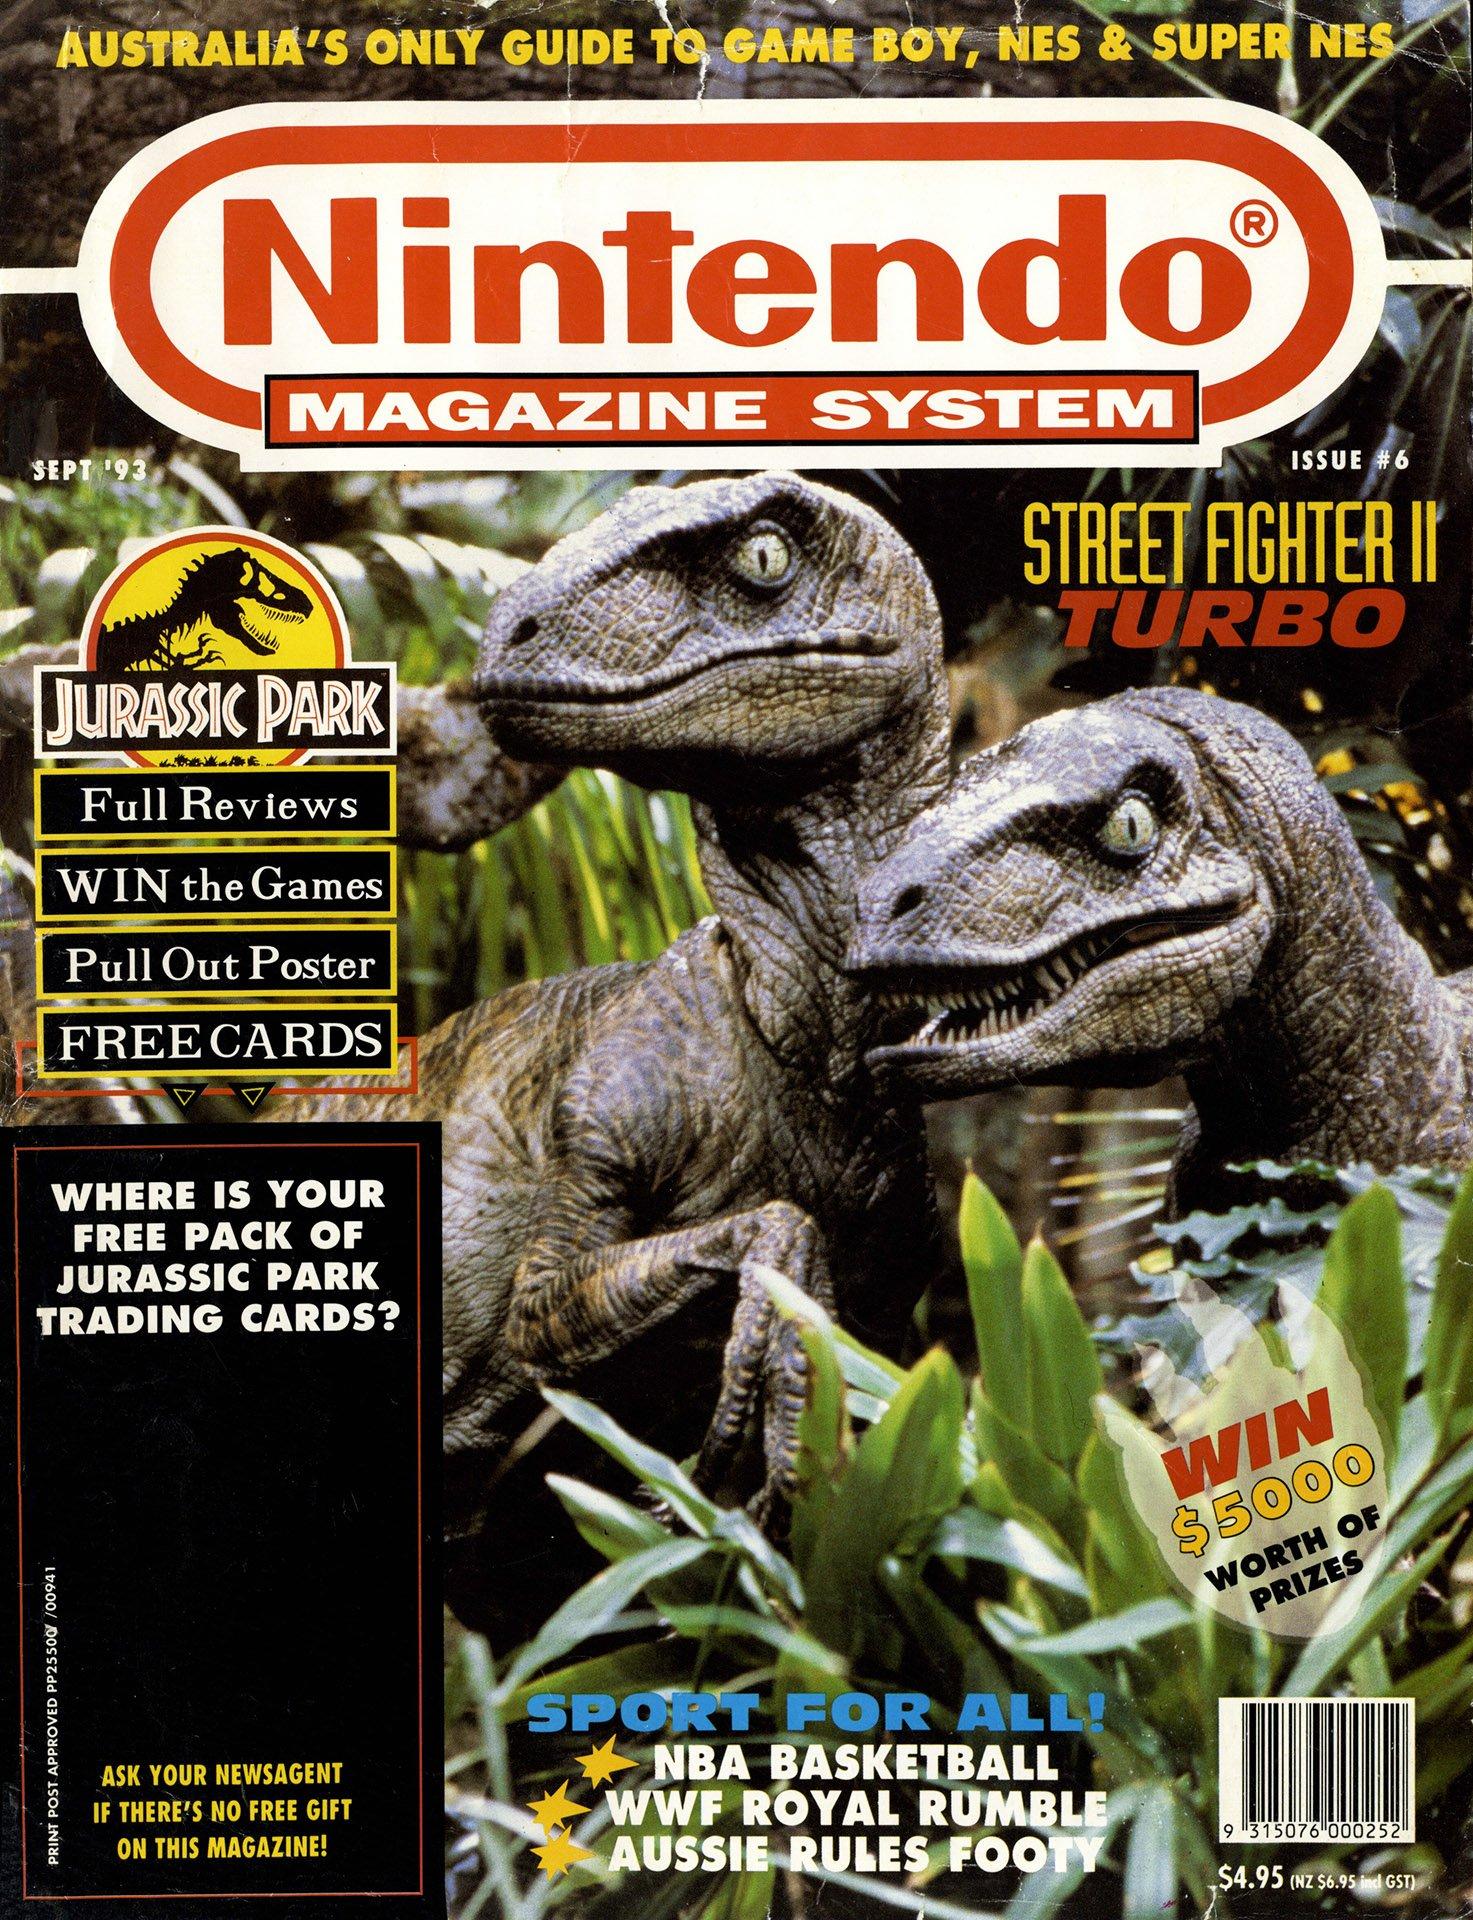 Nintendo Magazine System (AUS) 006 (September 1993)